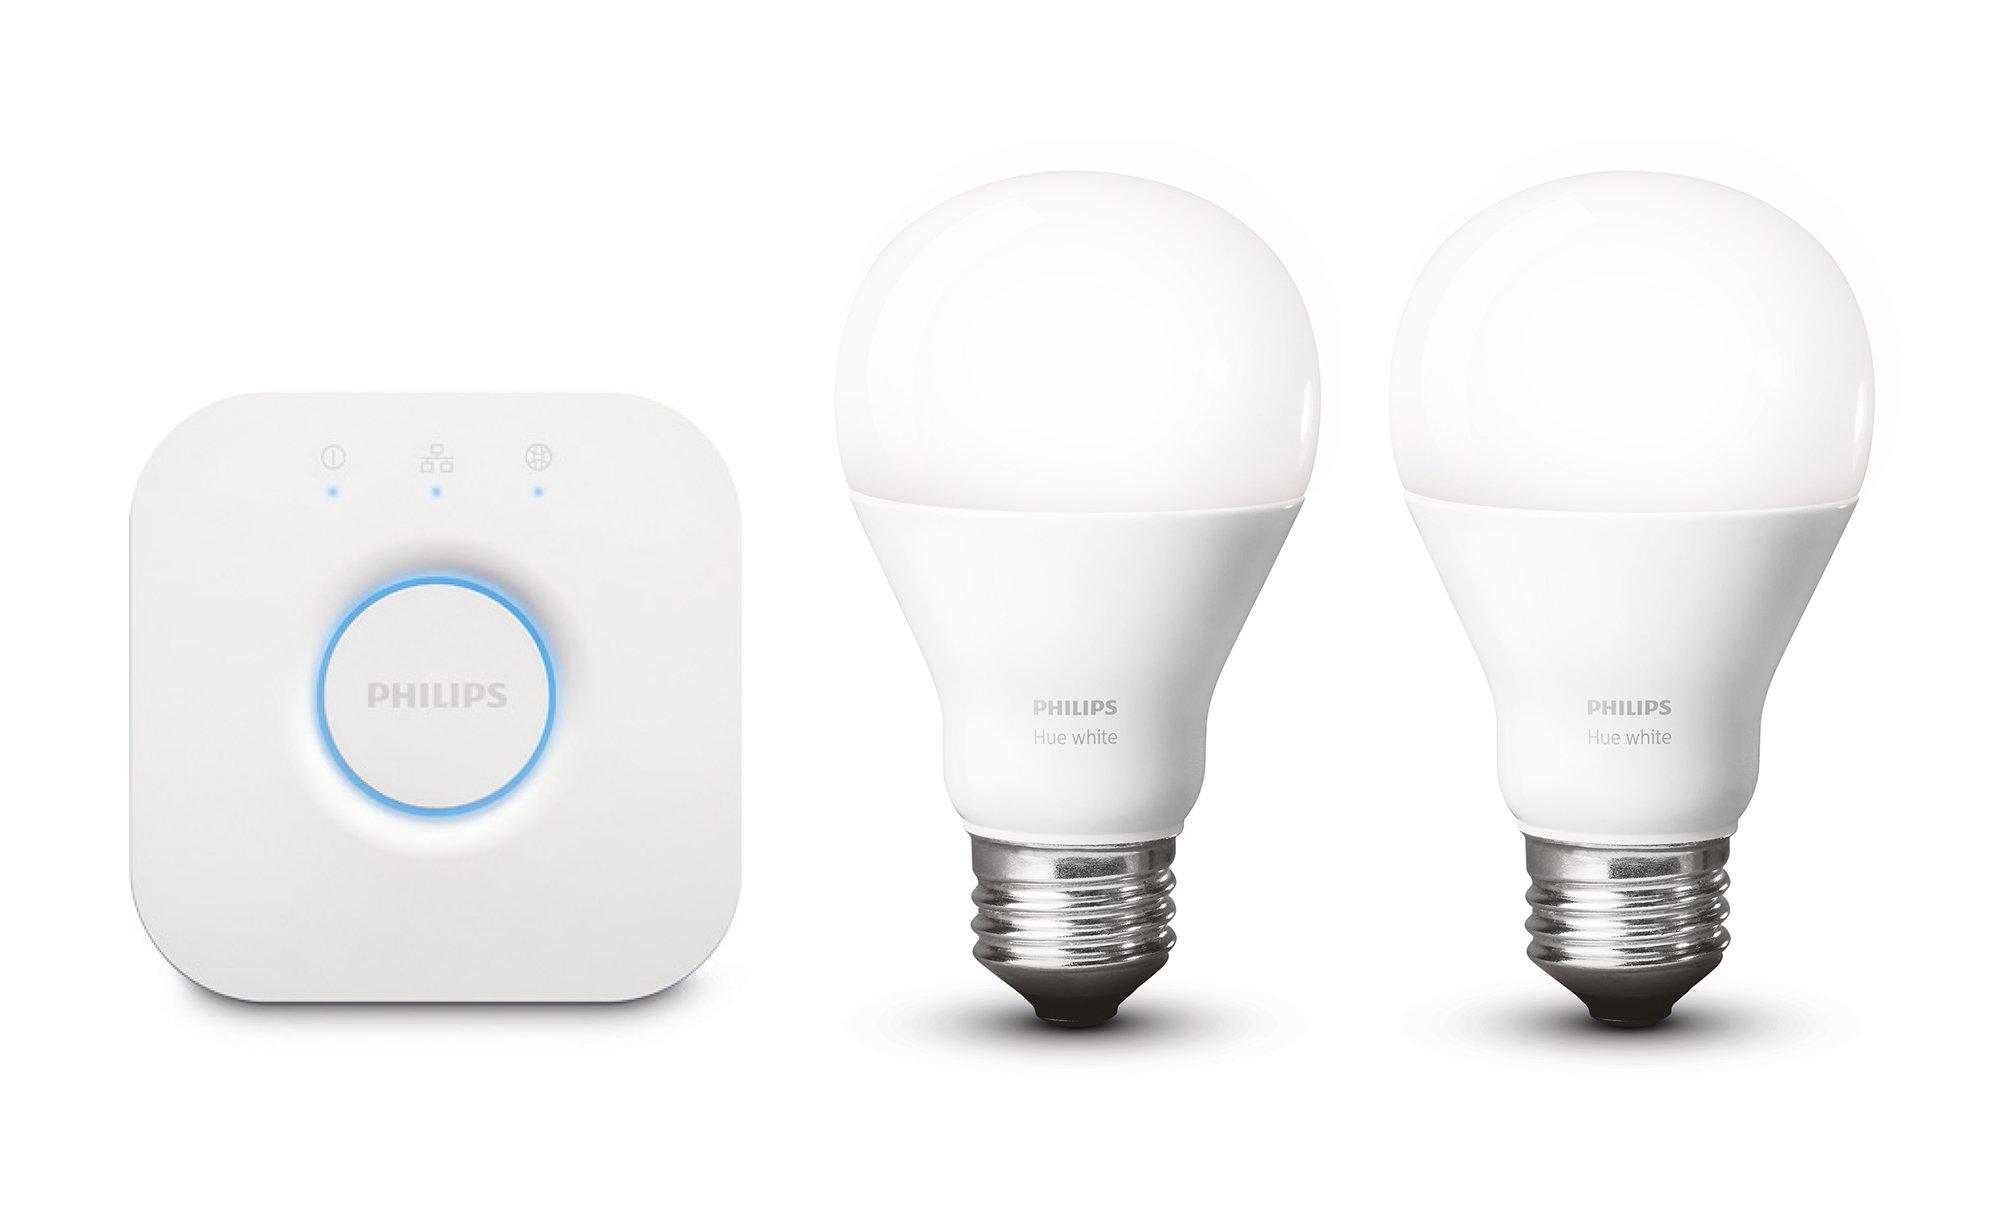 Philips Hue White Personal Wireless Lighting LED Starter Kit, 2 x 8.5W E27 Hue White Bulbs, 1 x Hue Bridge 2.0, Apple Home Kit Enabled, Works with Alexa